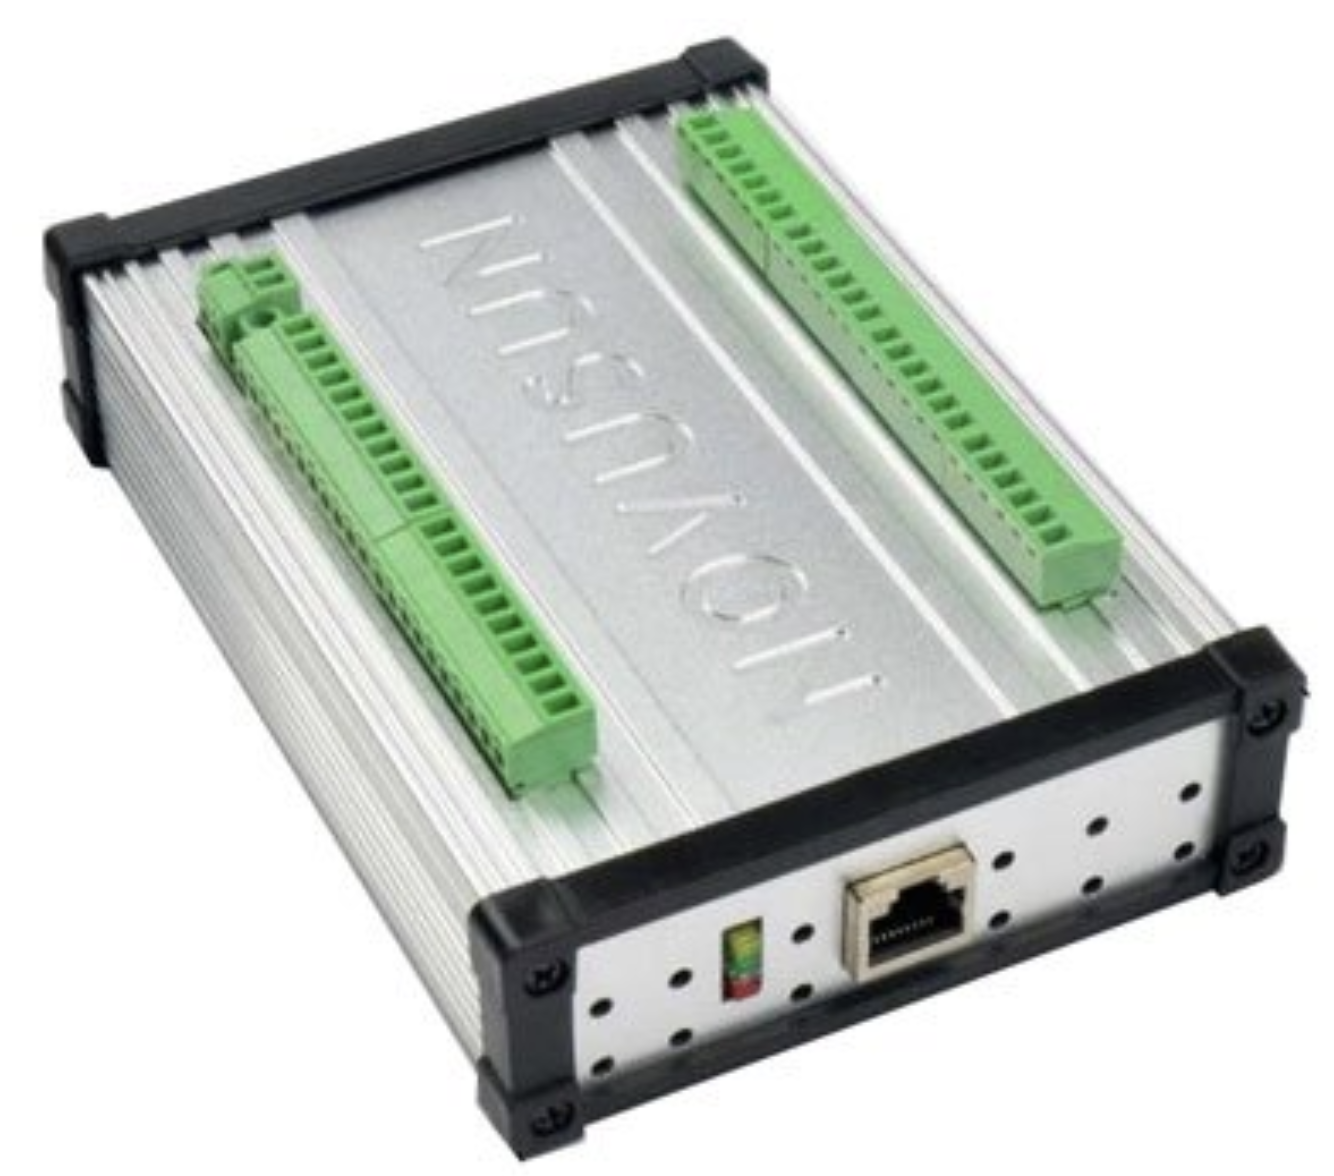 MACH3 Ethernet port 6 axis Motion Controller NVEC400